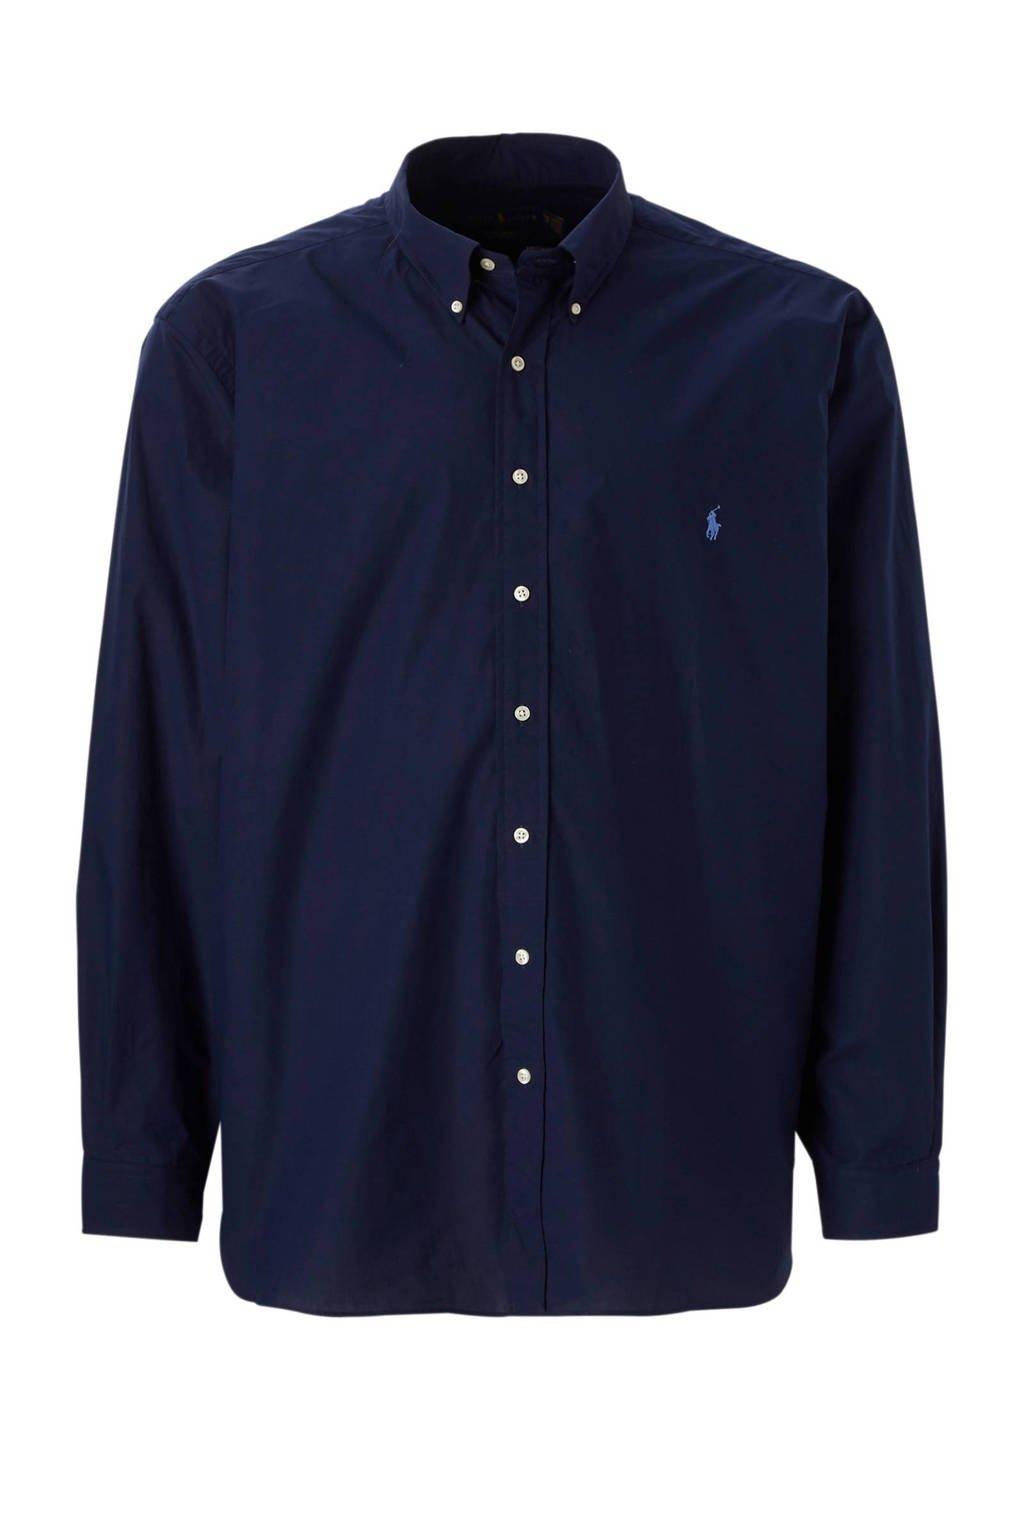 POLO Ralph Lauren Big & Tall +size regular fit overhemd, Donkerblauw